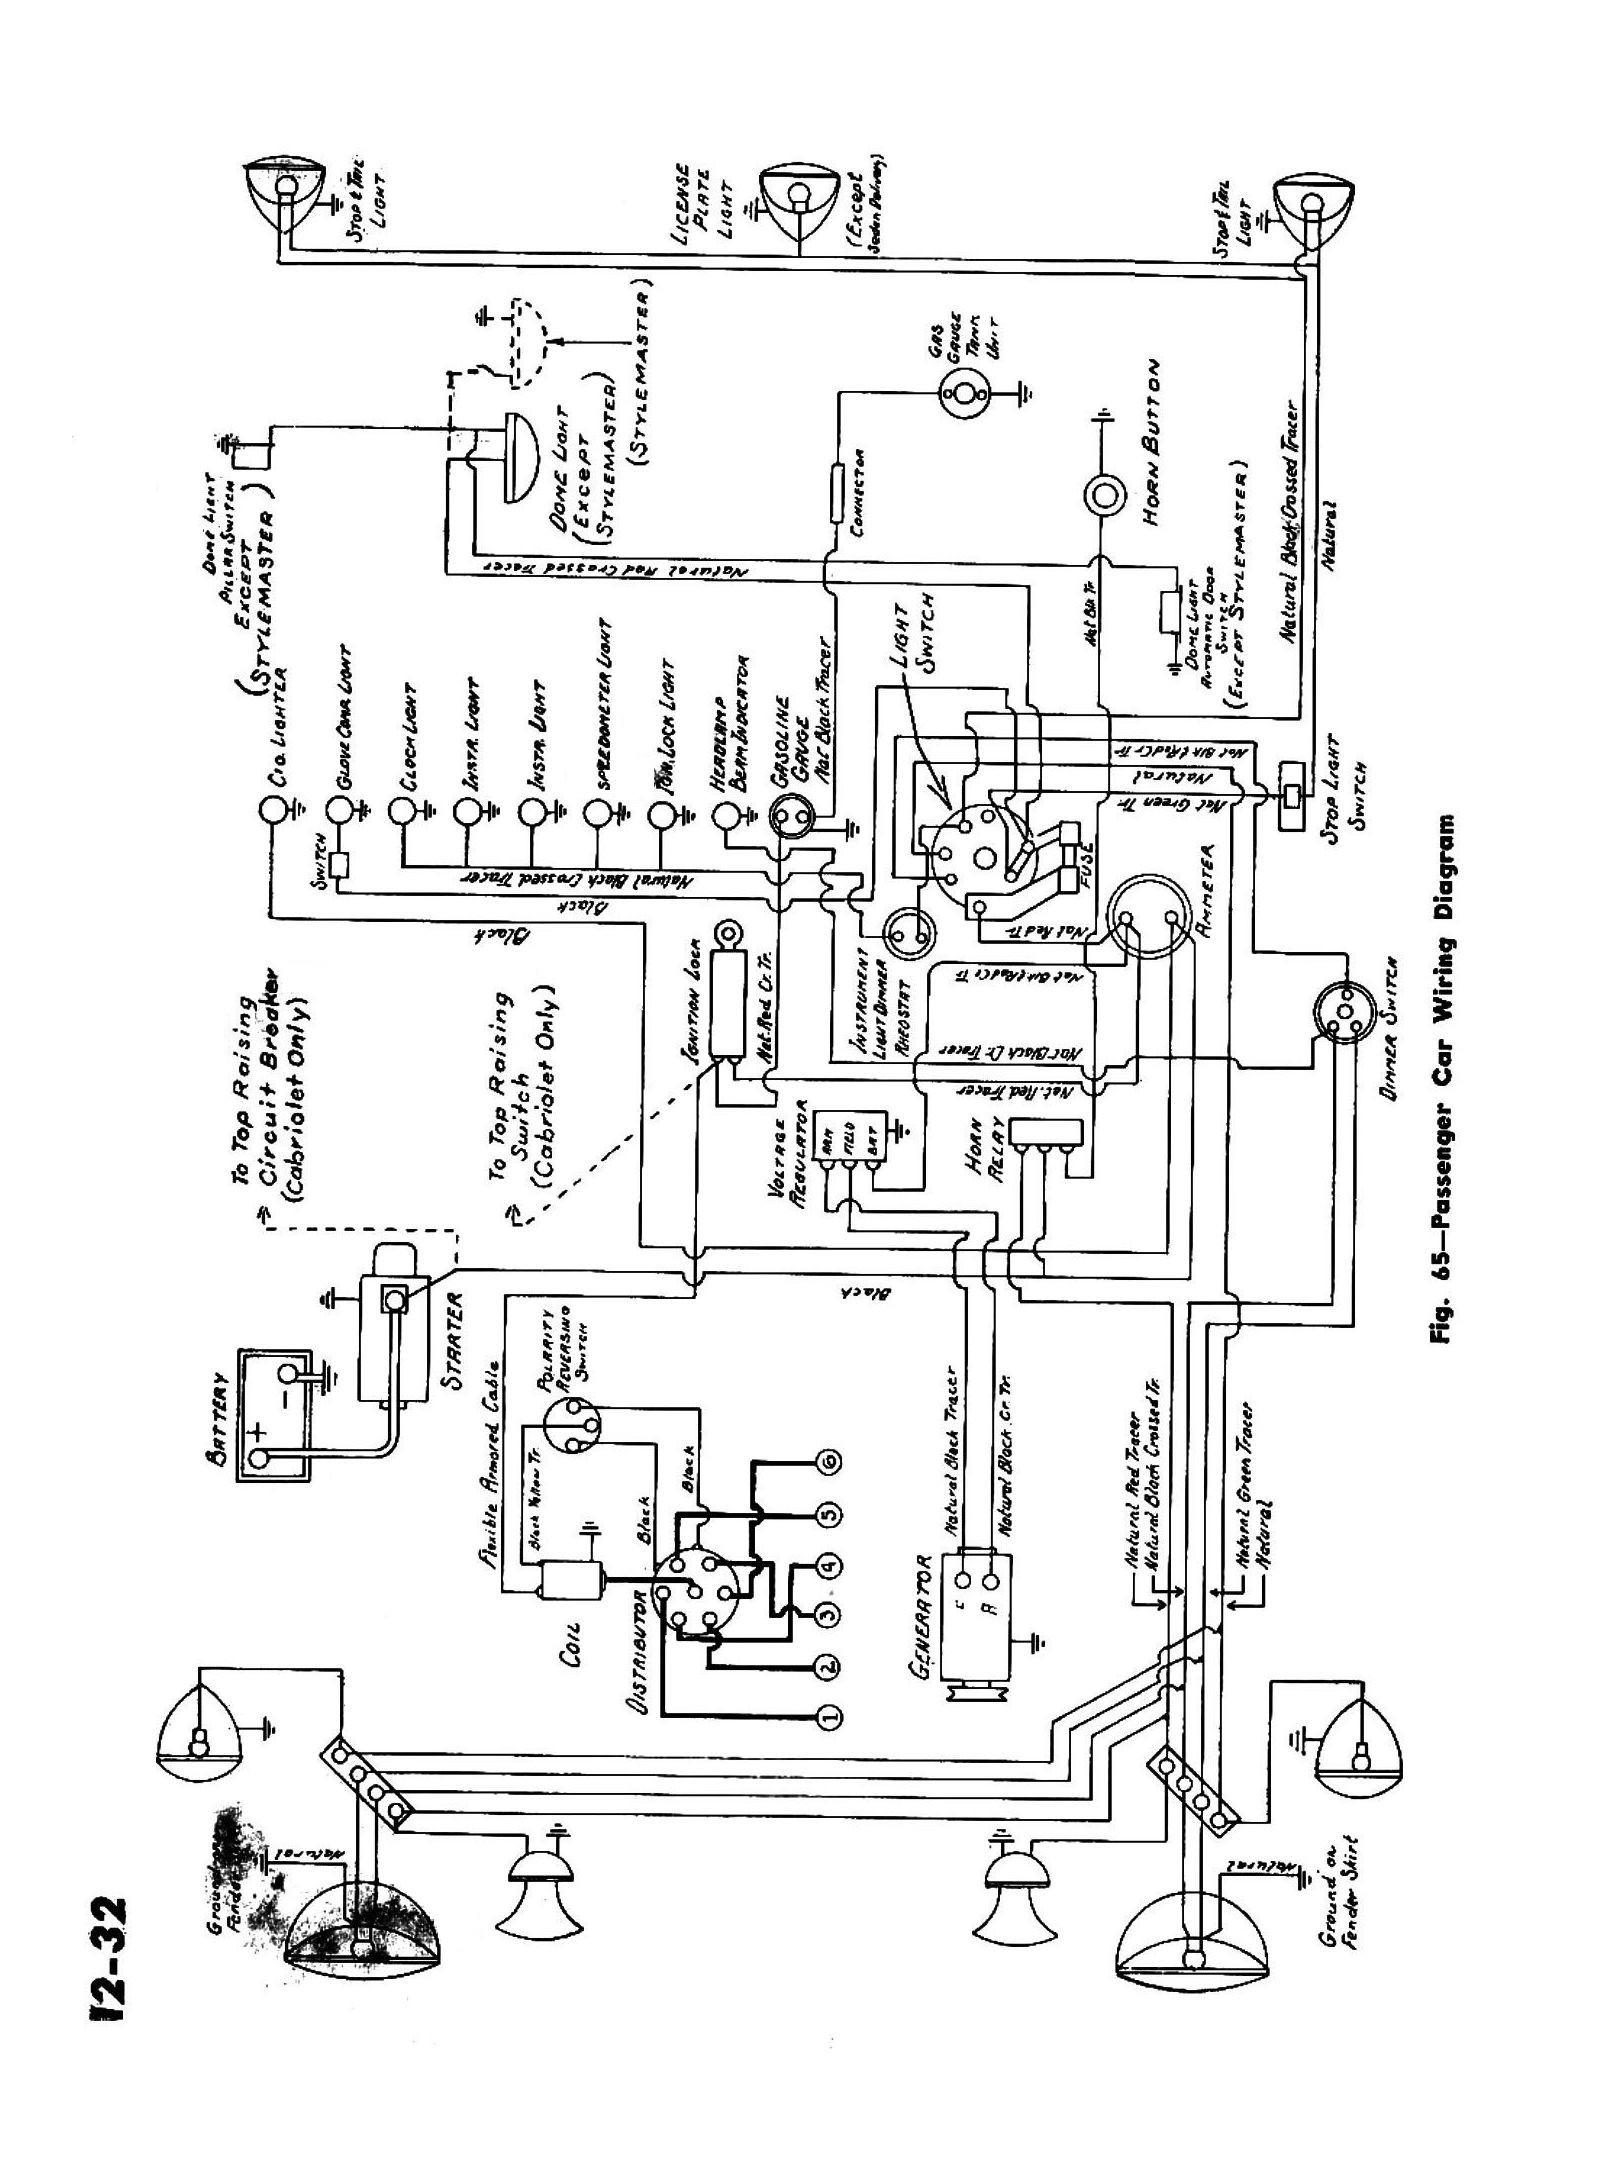 simple auto wiring diagram cr 3975  simple car wiring diagrams free diagram  simple car wiring diagrams free diagram